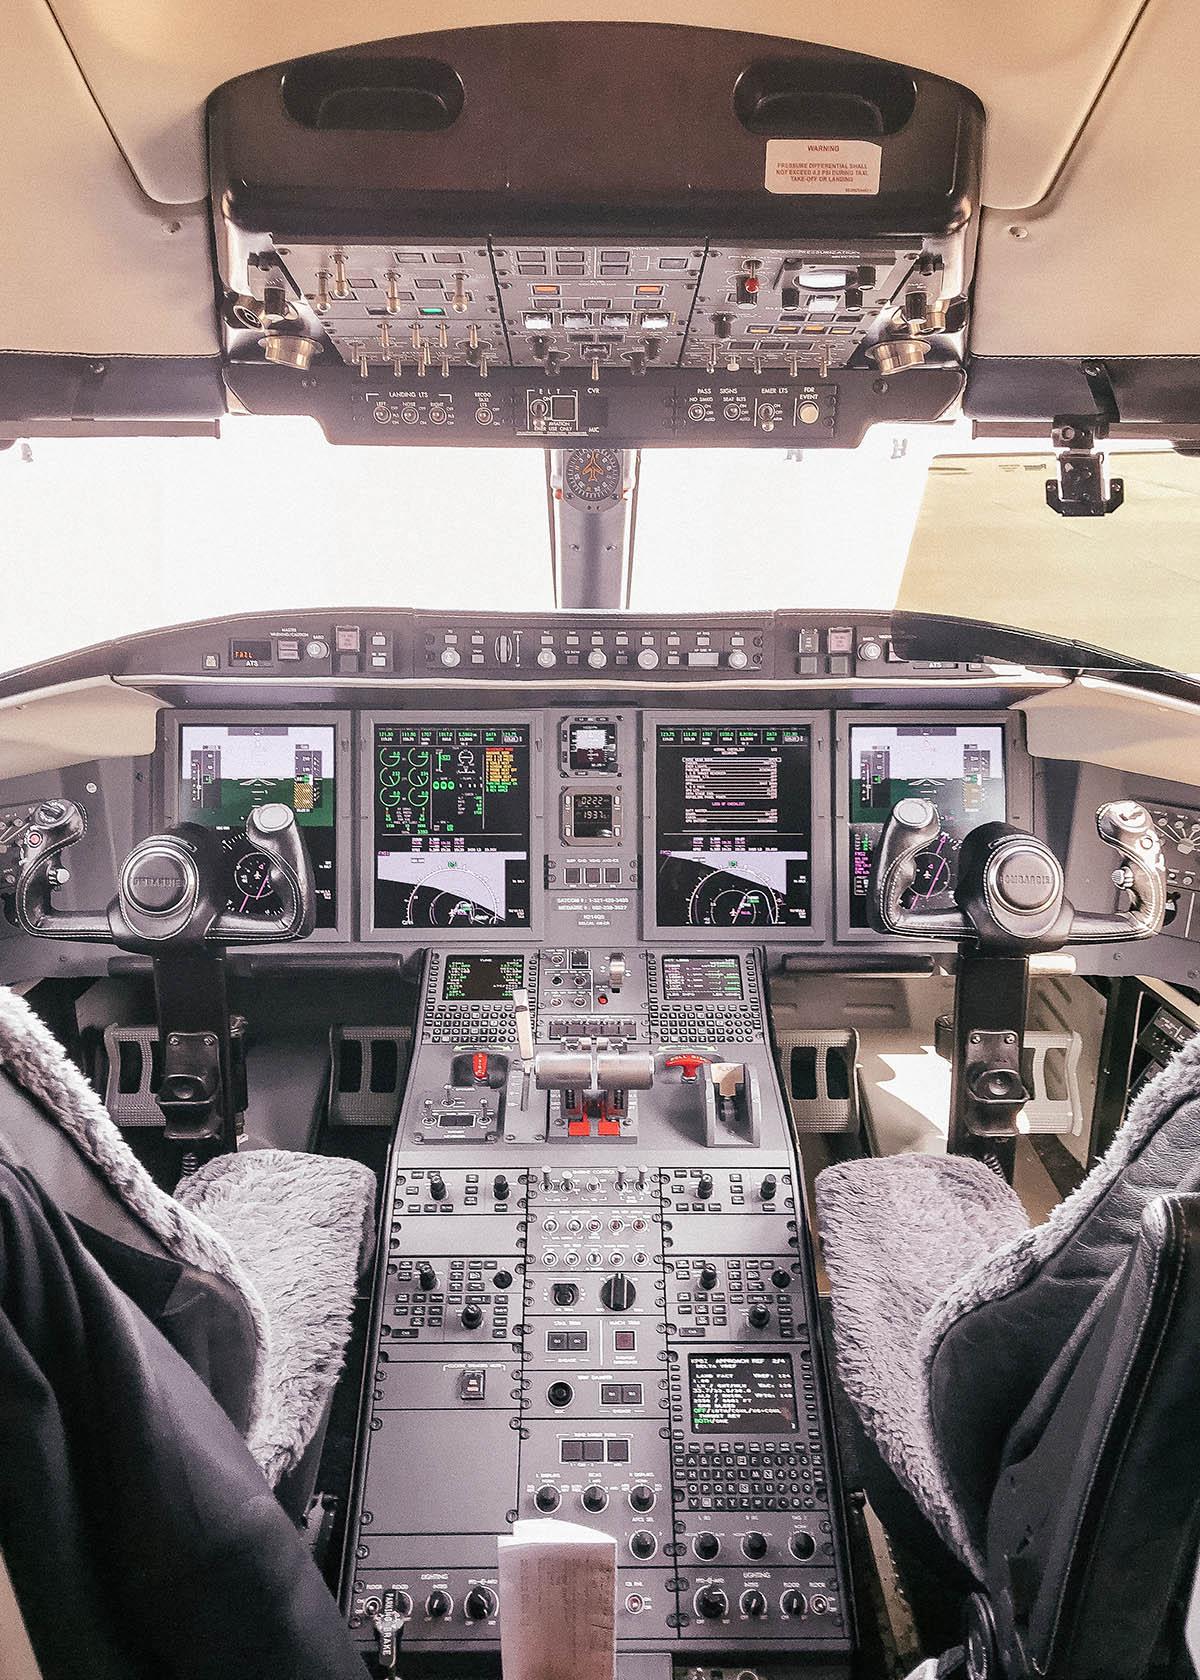 NetJets Private Jet Experience x Four Seasons Palm Beach